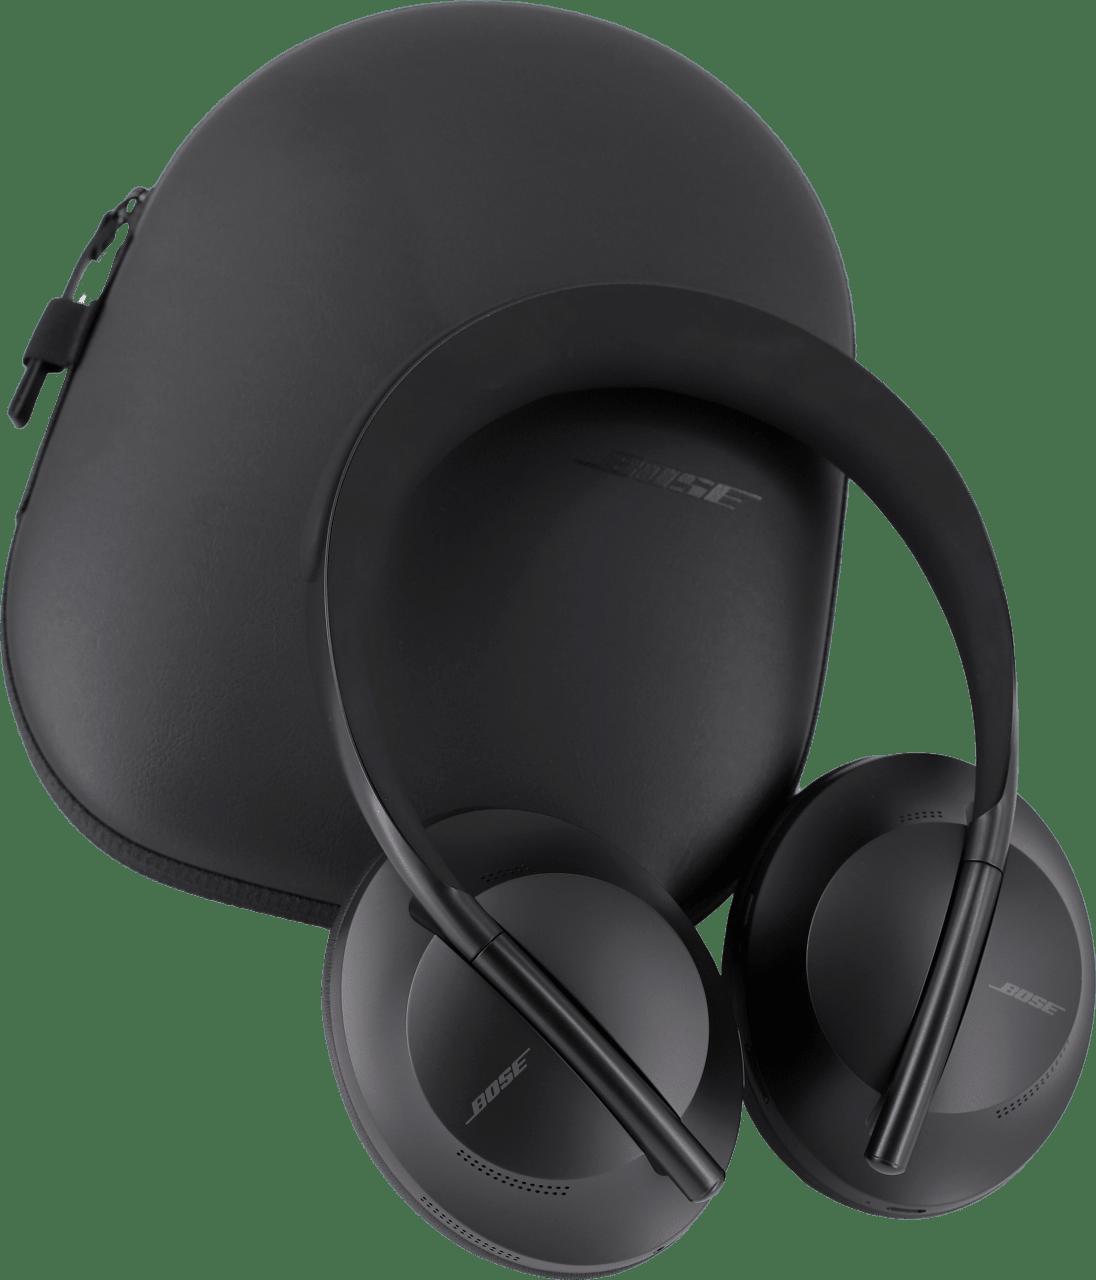 Black Bose 700 Over-ear Bluetooth Headphones.3